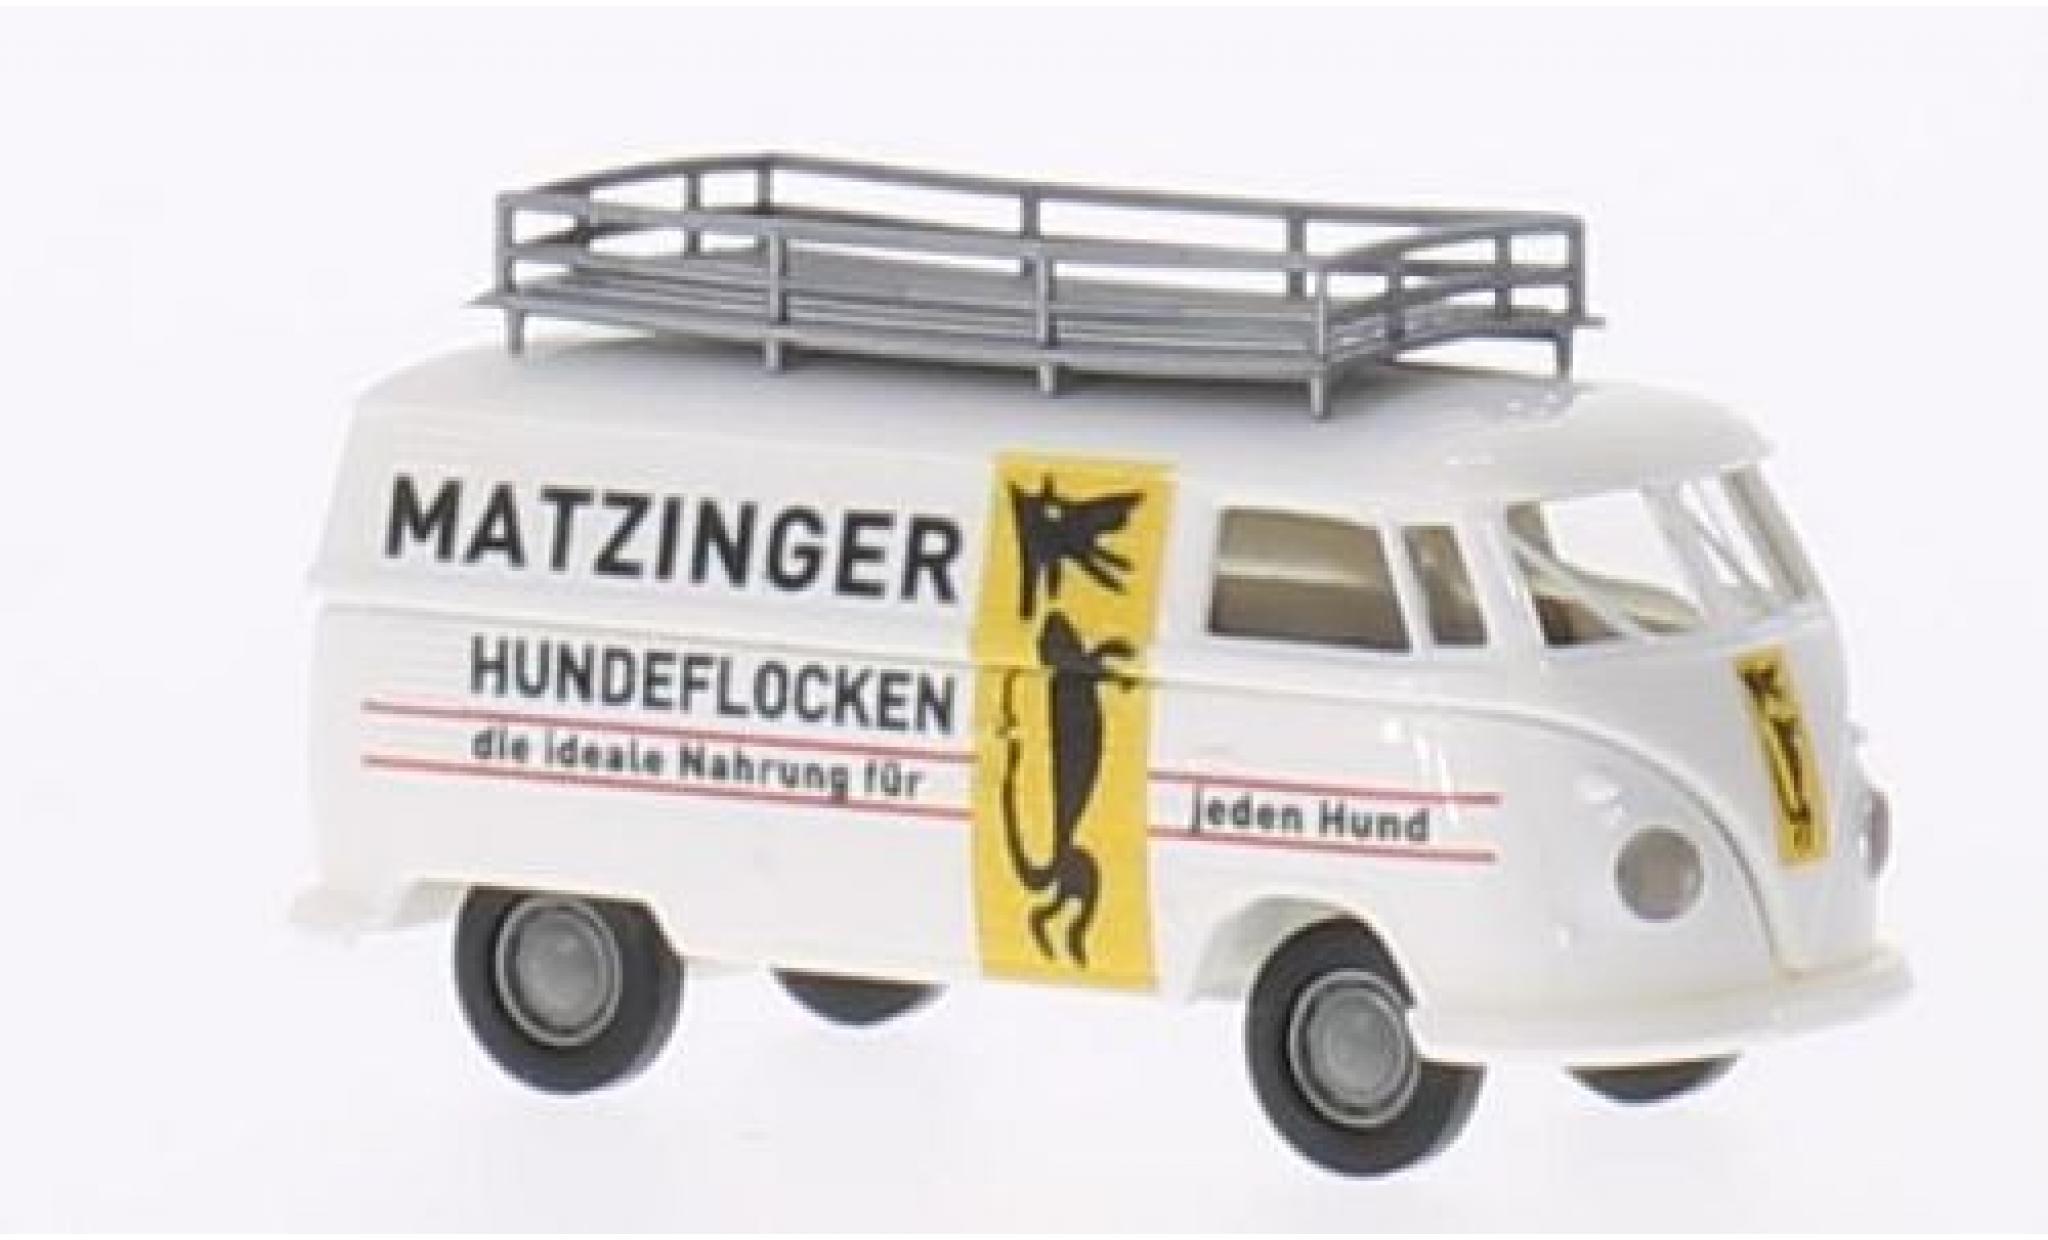 Volkswagen T1 1/87 Brekina b Kasten Matzinger Hundeflocken